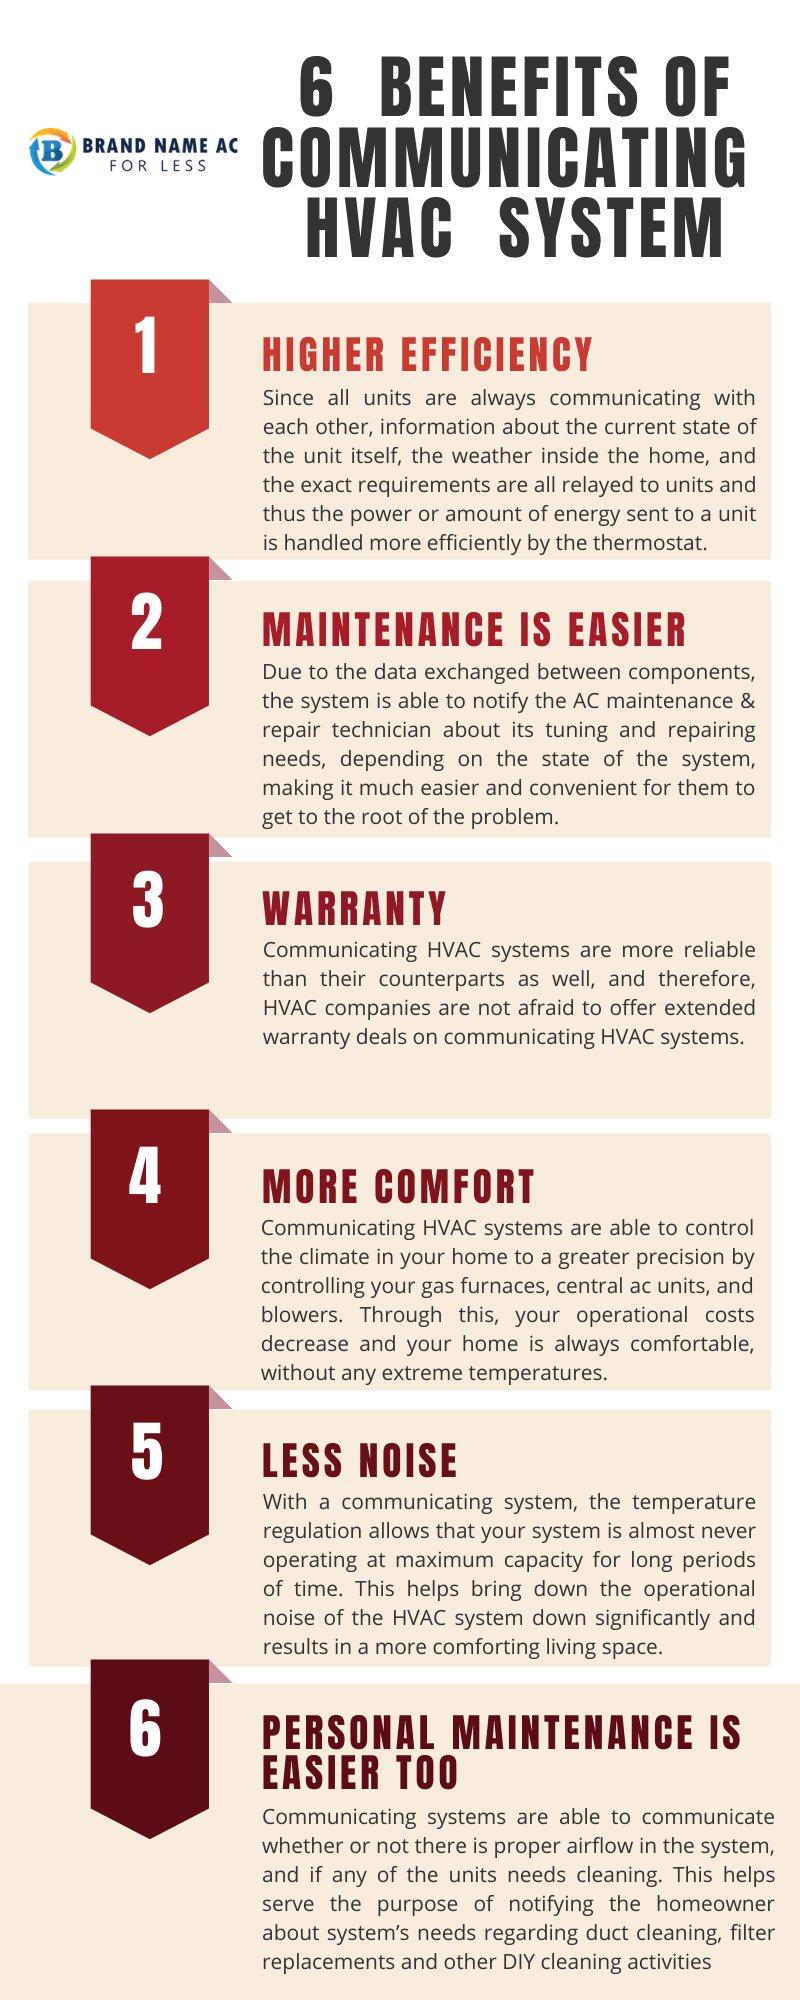 6 Benefits of Communicating HVAC System